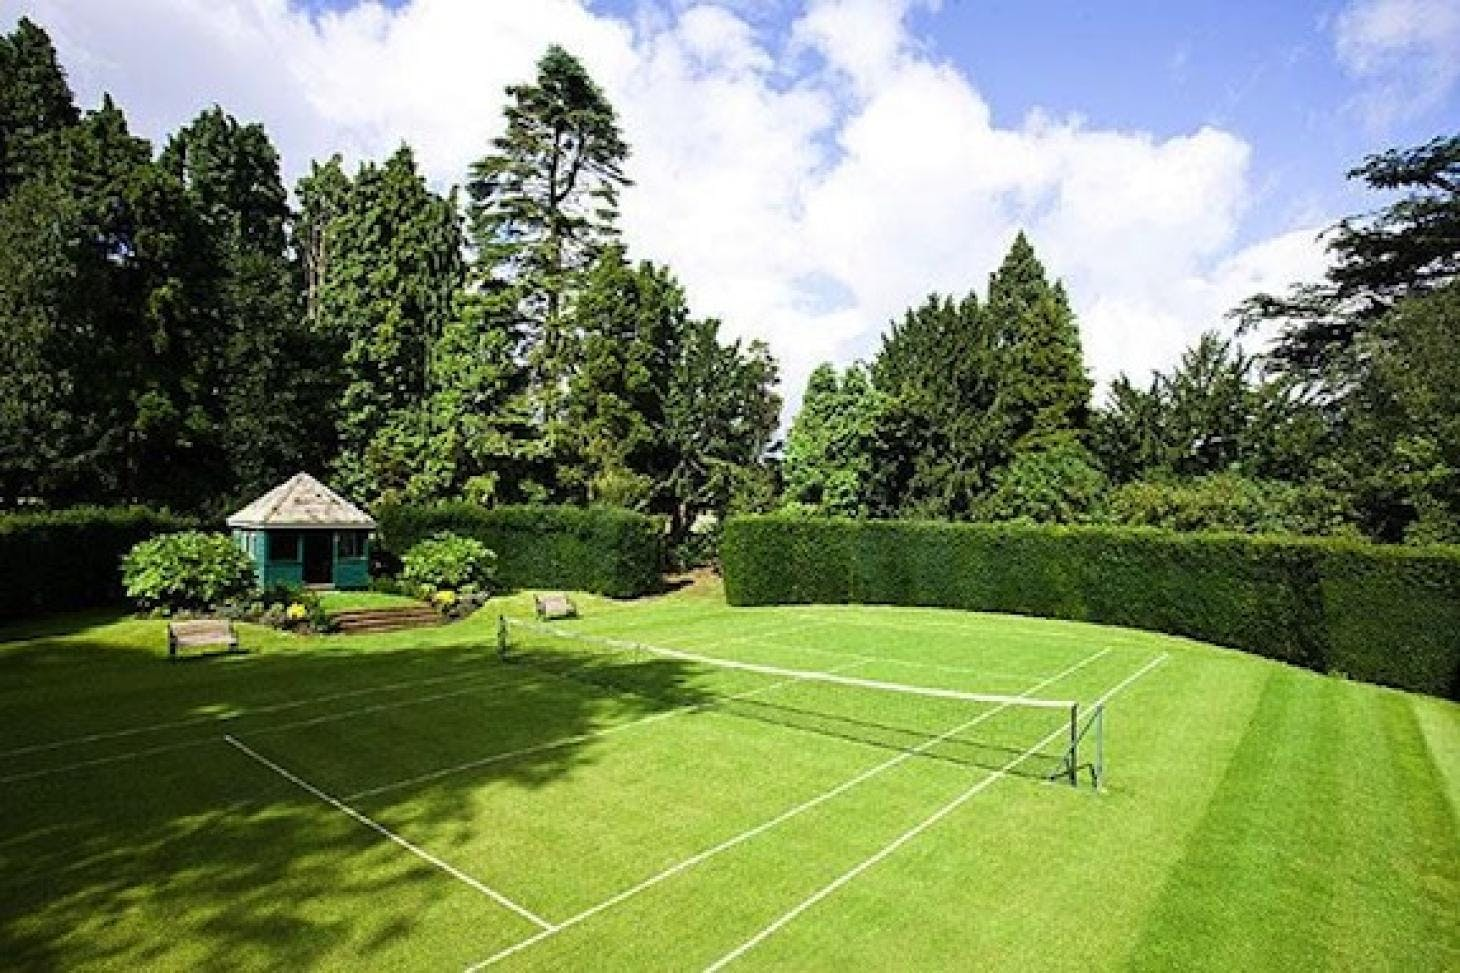 Luton Hoo Hotel Golf and Spa Outdoor | Grass tennis court